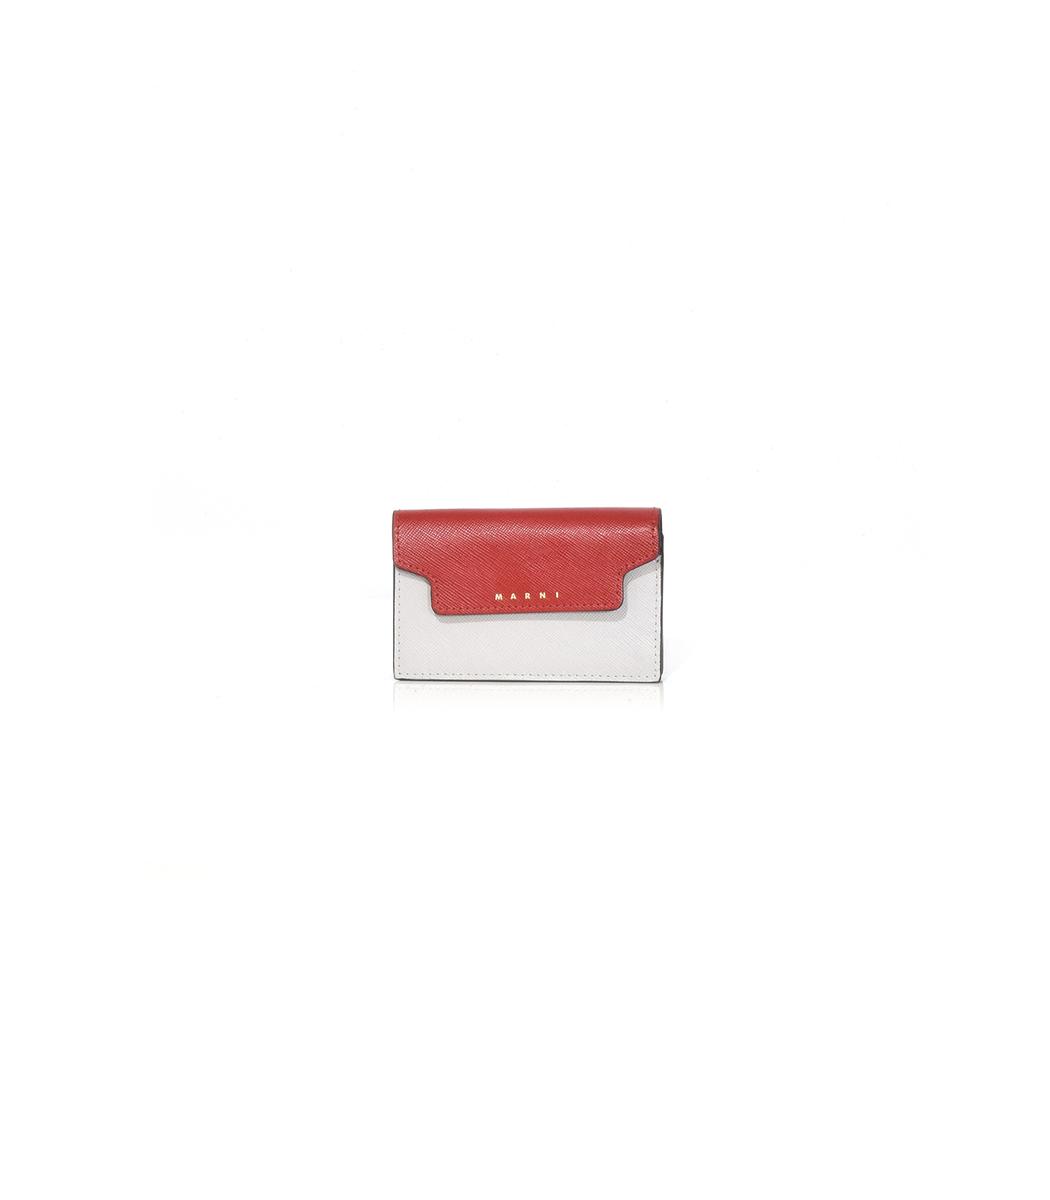 MARNI Red + Pelican Saffiano Wallet